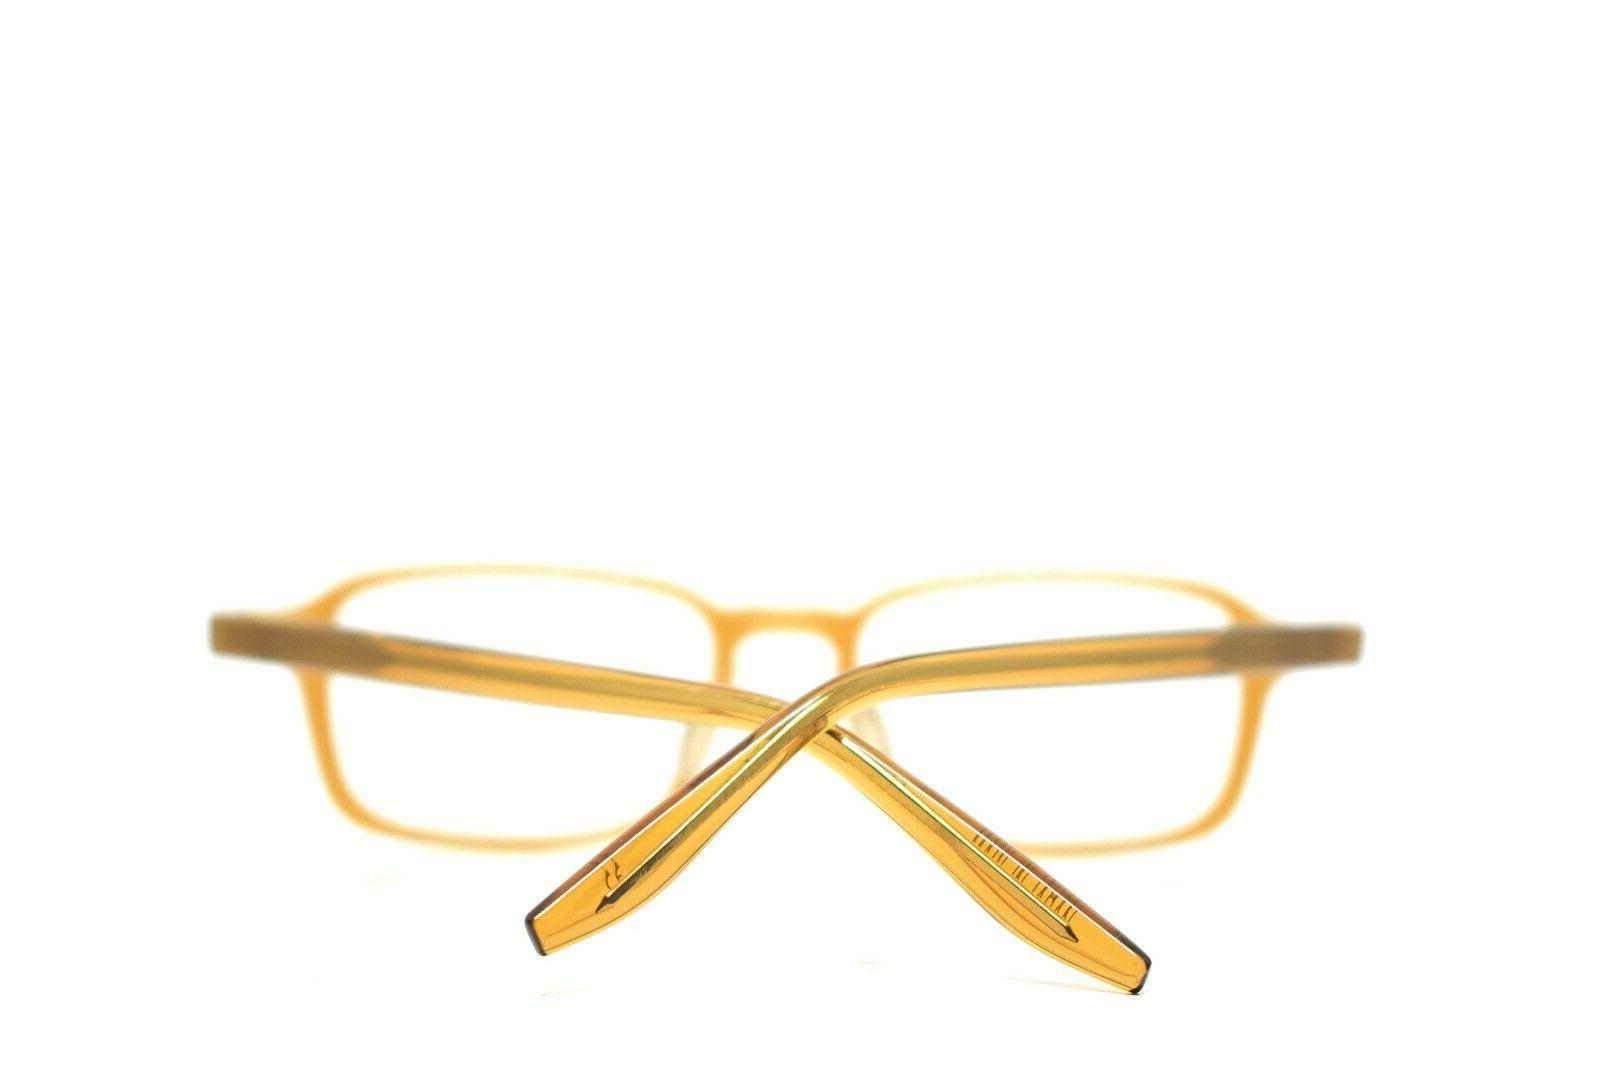 Barton Perreira Prescription eyeglasses Asian Fit JESTON 50-19-145 Japan